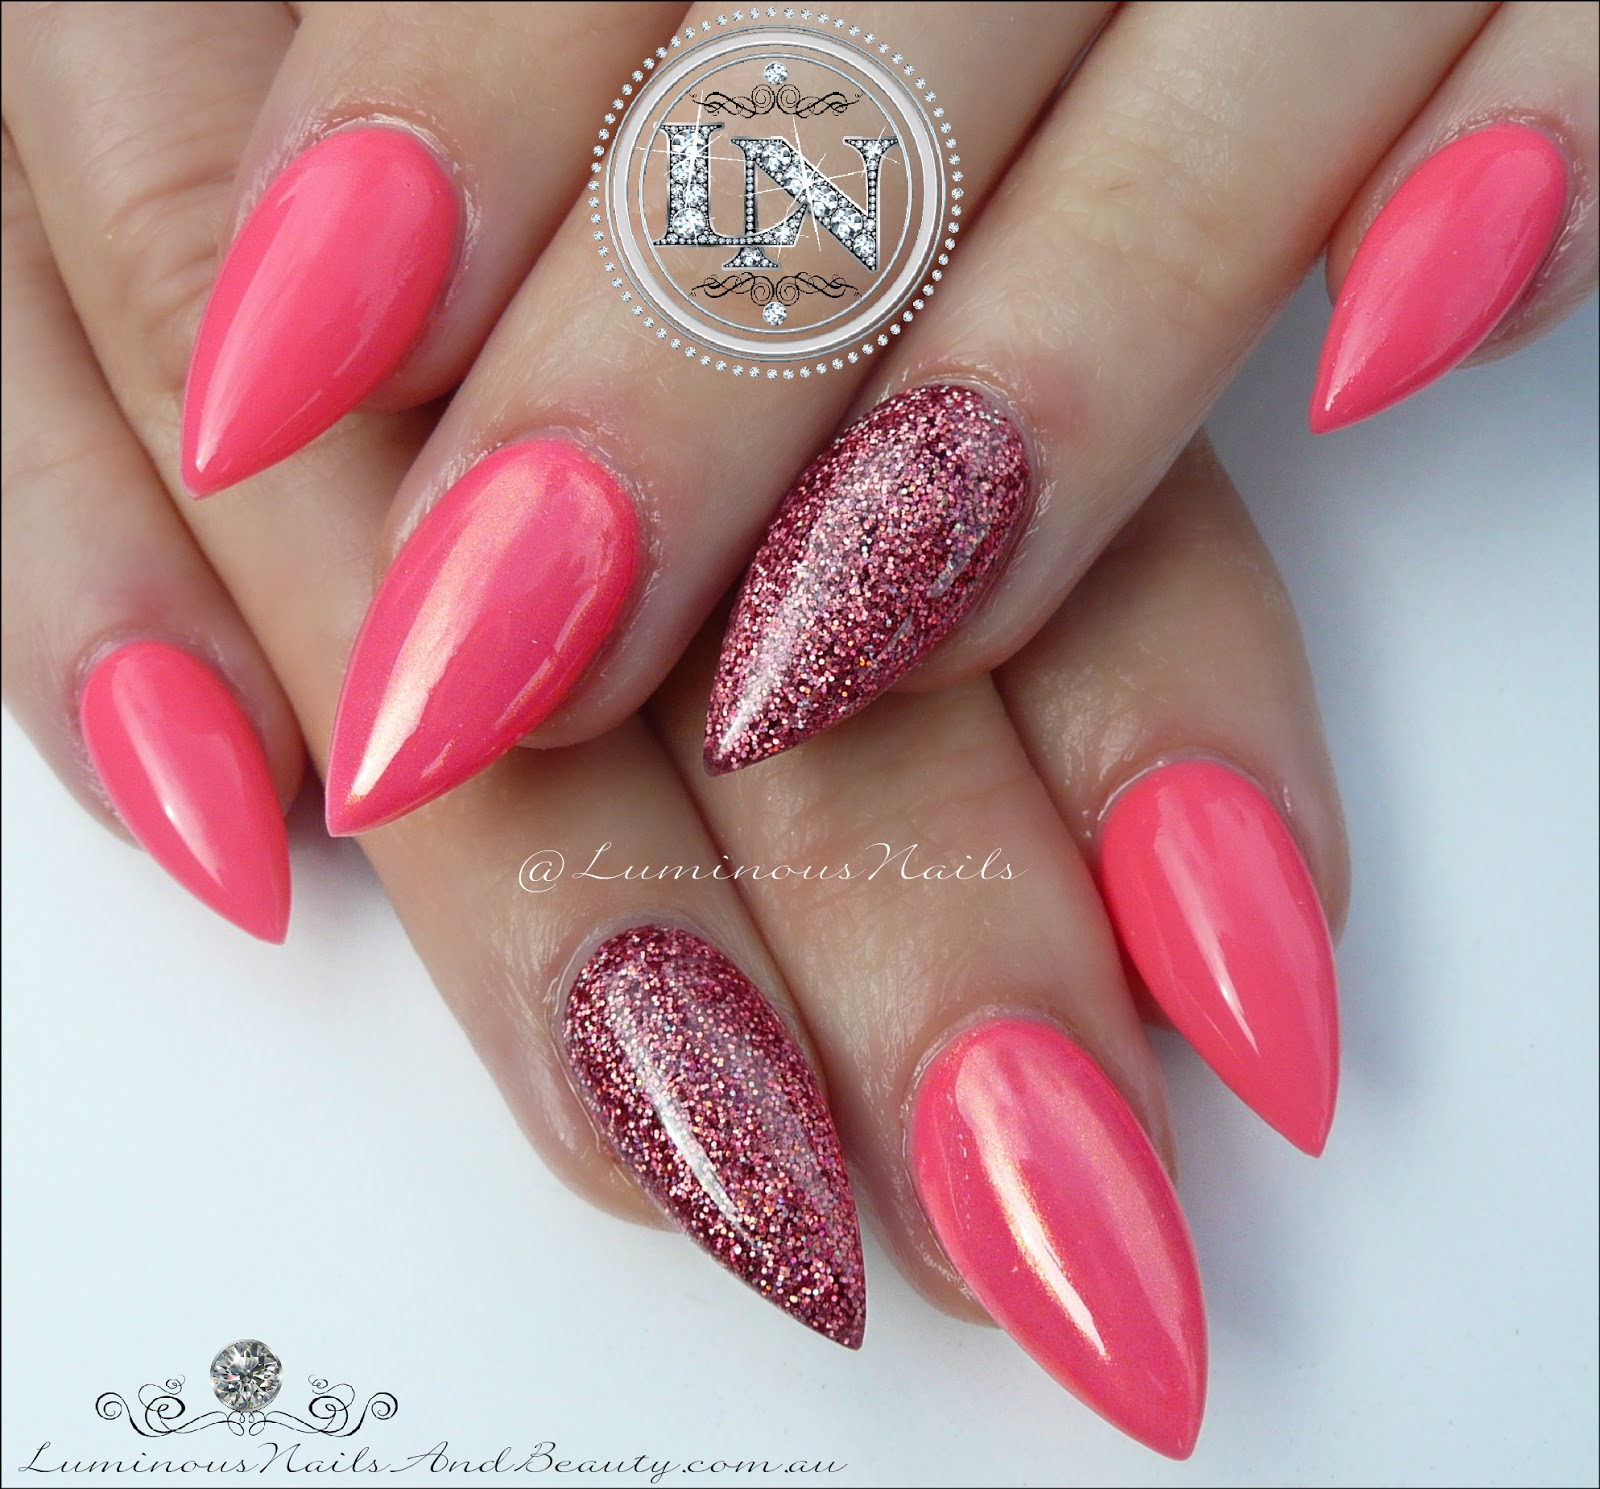 Luminous Nails: Gorgeous Coral & Glittery Rose Pink Glitter Acrylic ...